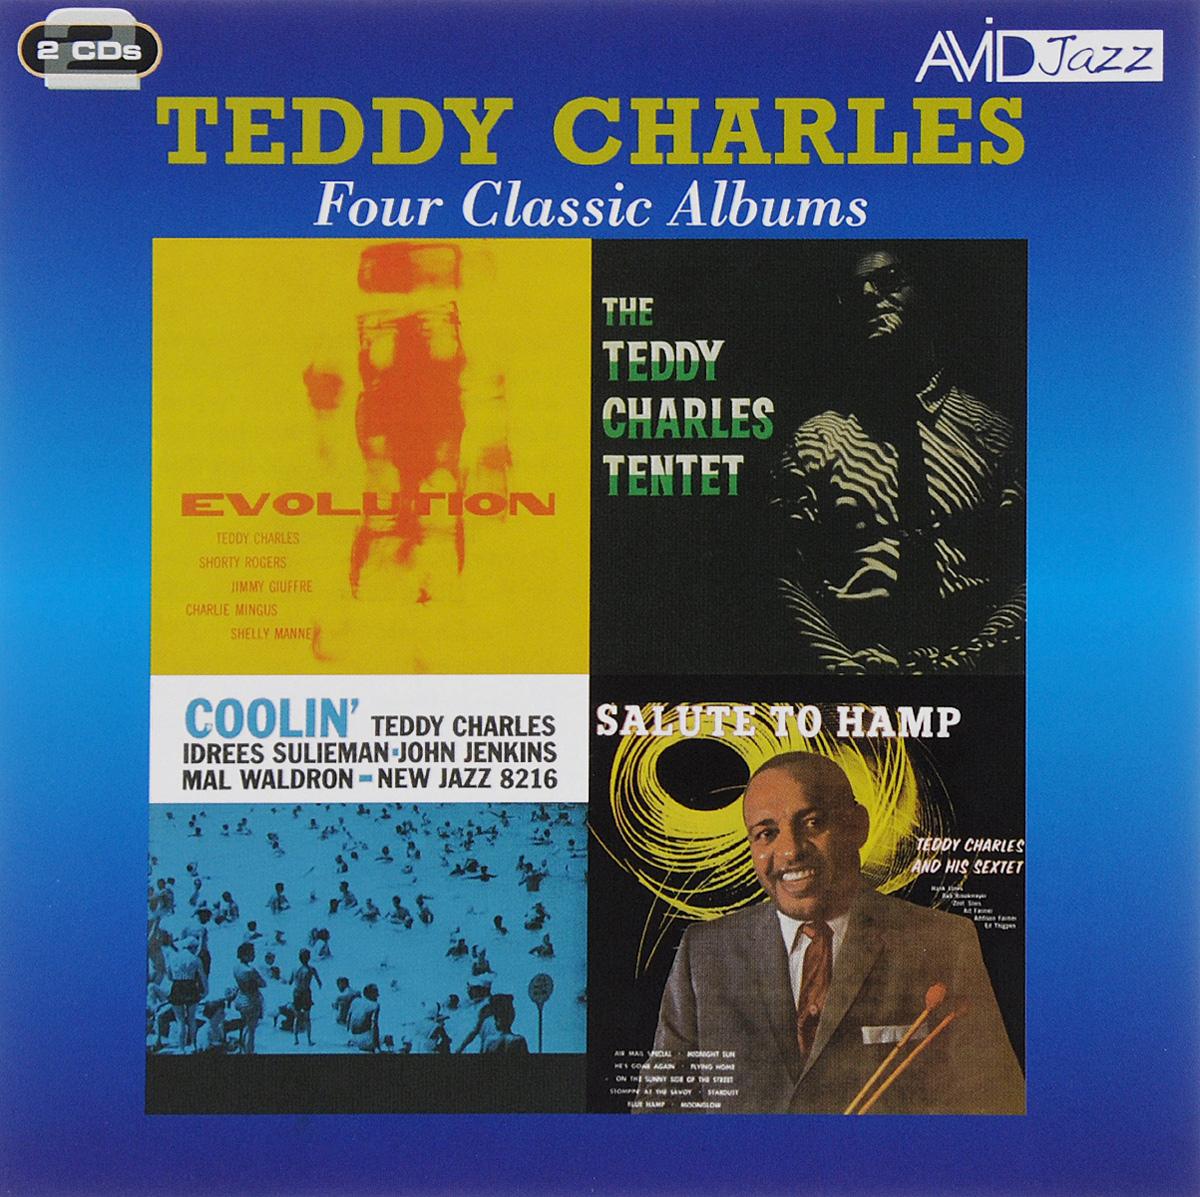 Тедди Чарльз Avid Jazz. Teddy Charles. Four Classic Albums (2 CD) уинтон келли avid jazz wynton kelly four classic albums 2 cd